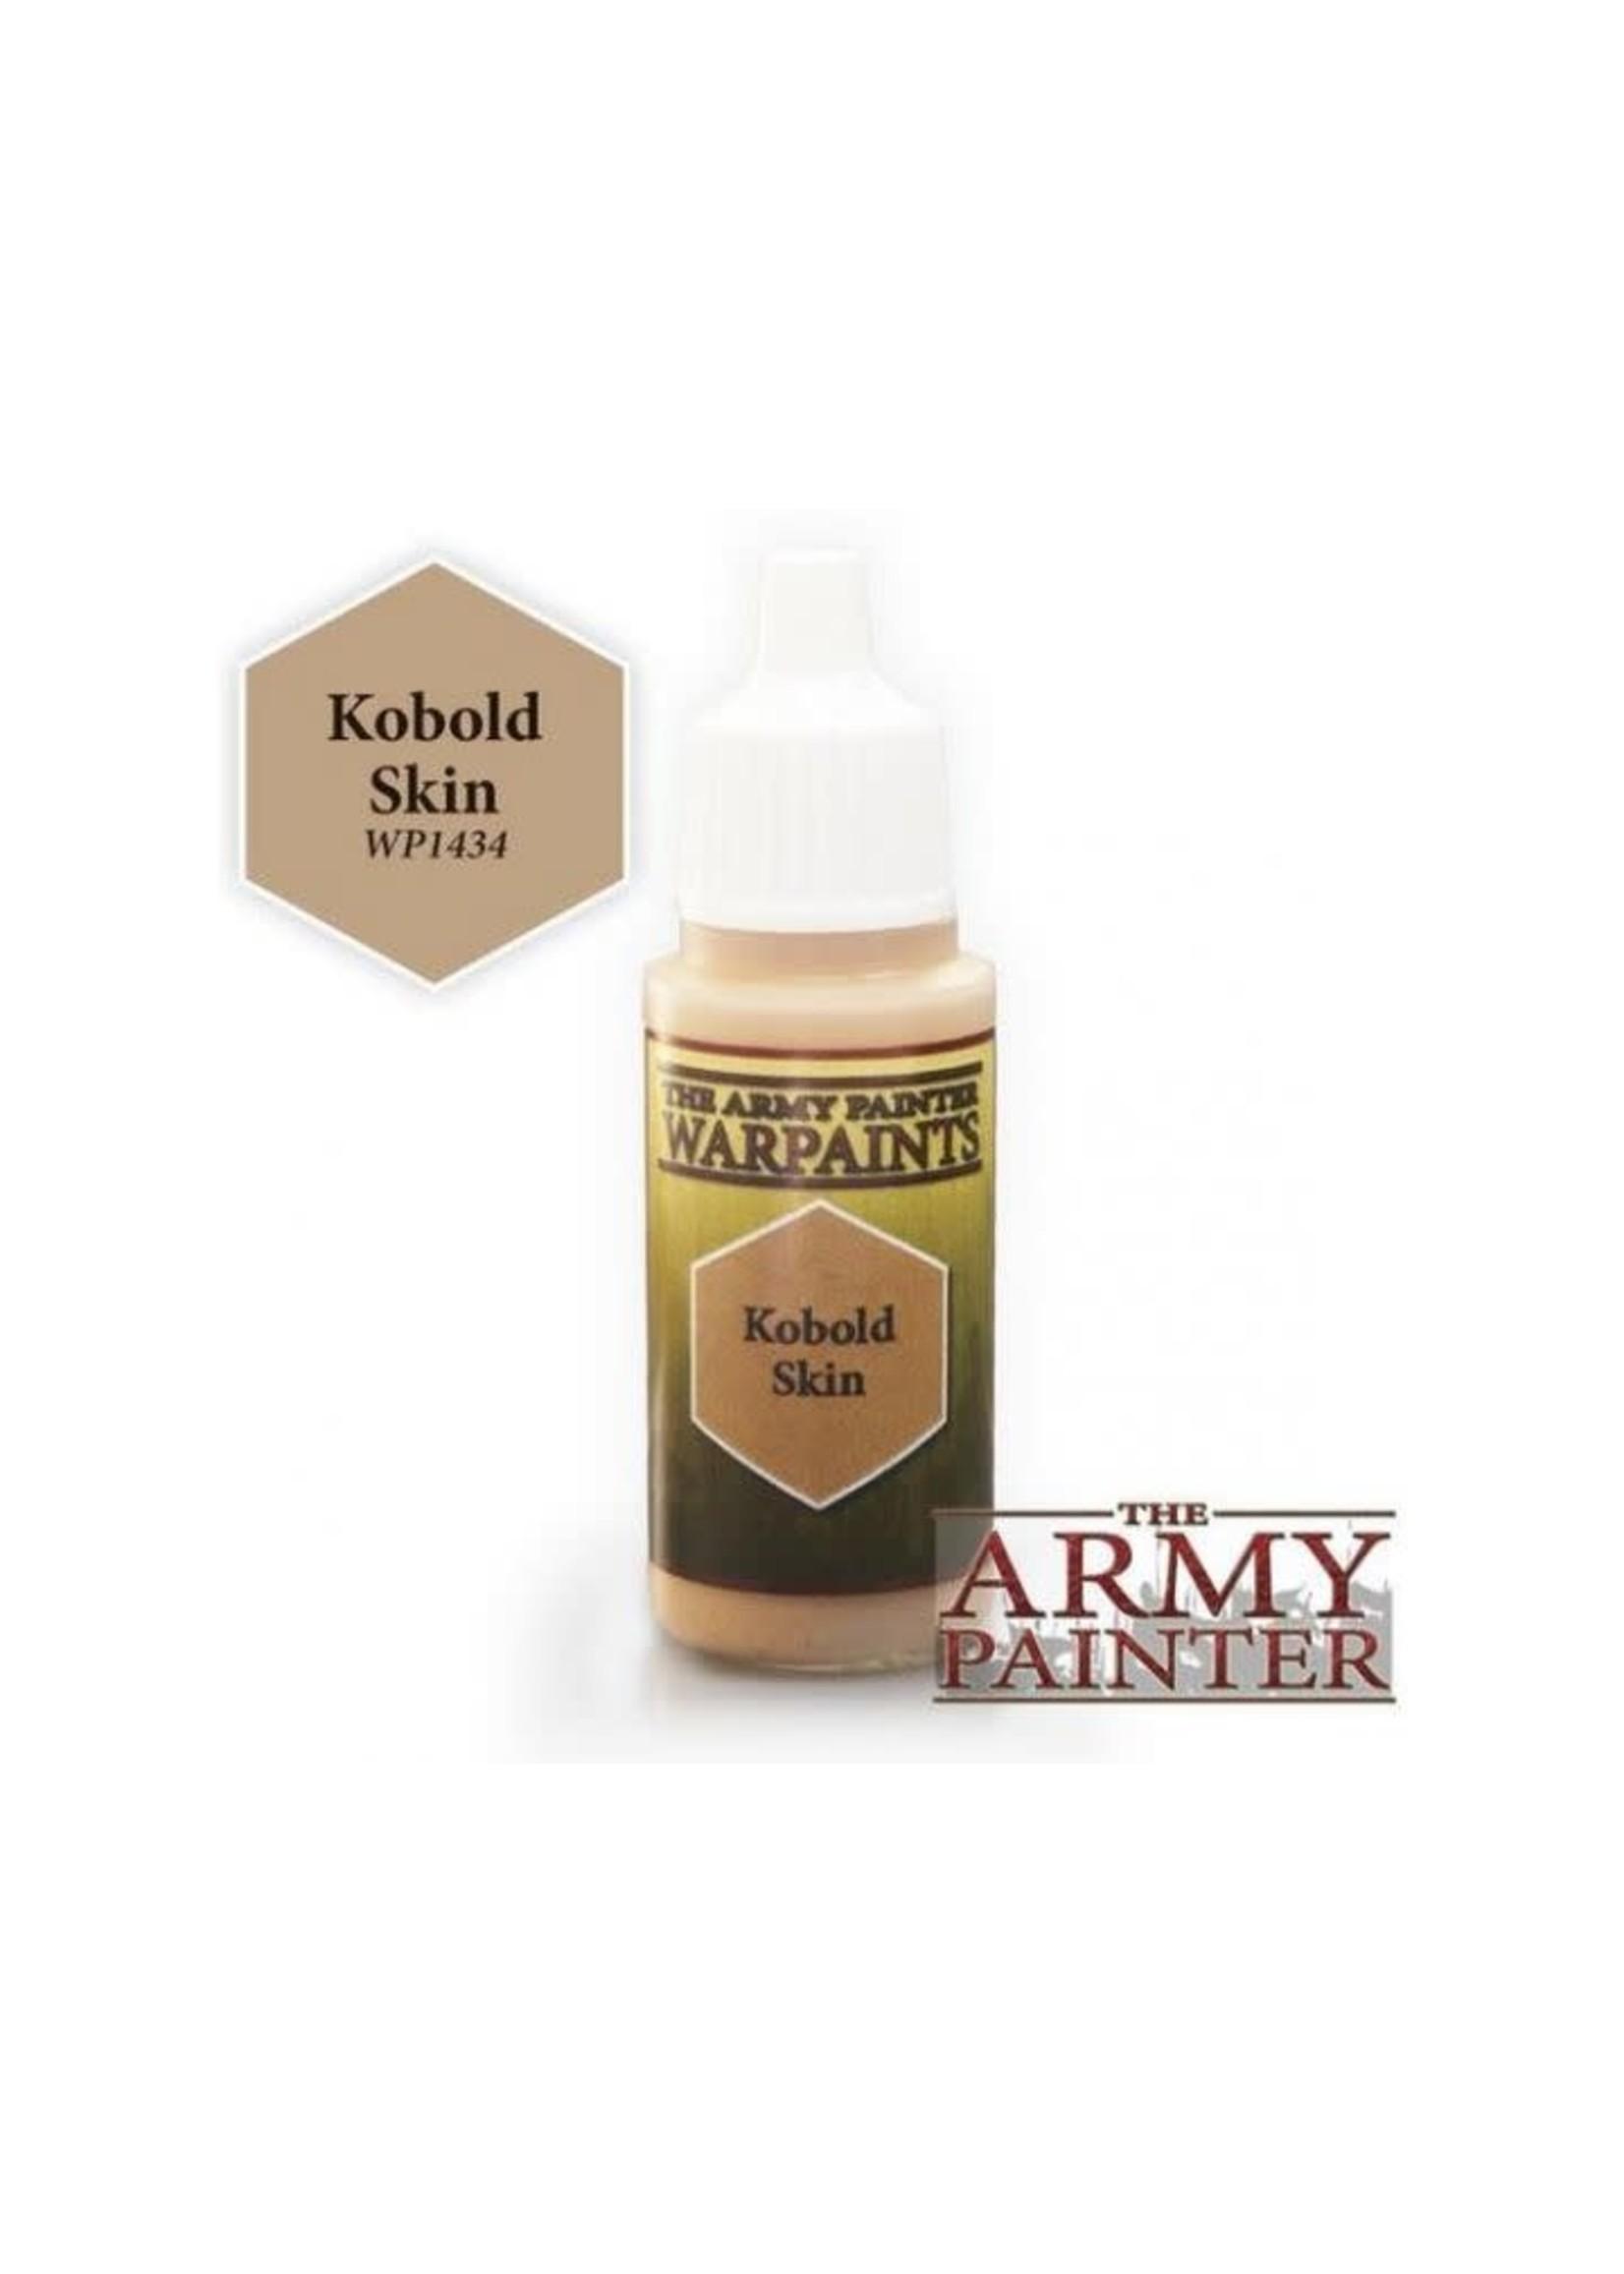 Army Painter Warpaints - Kobold Skin